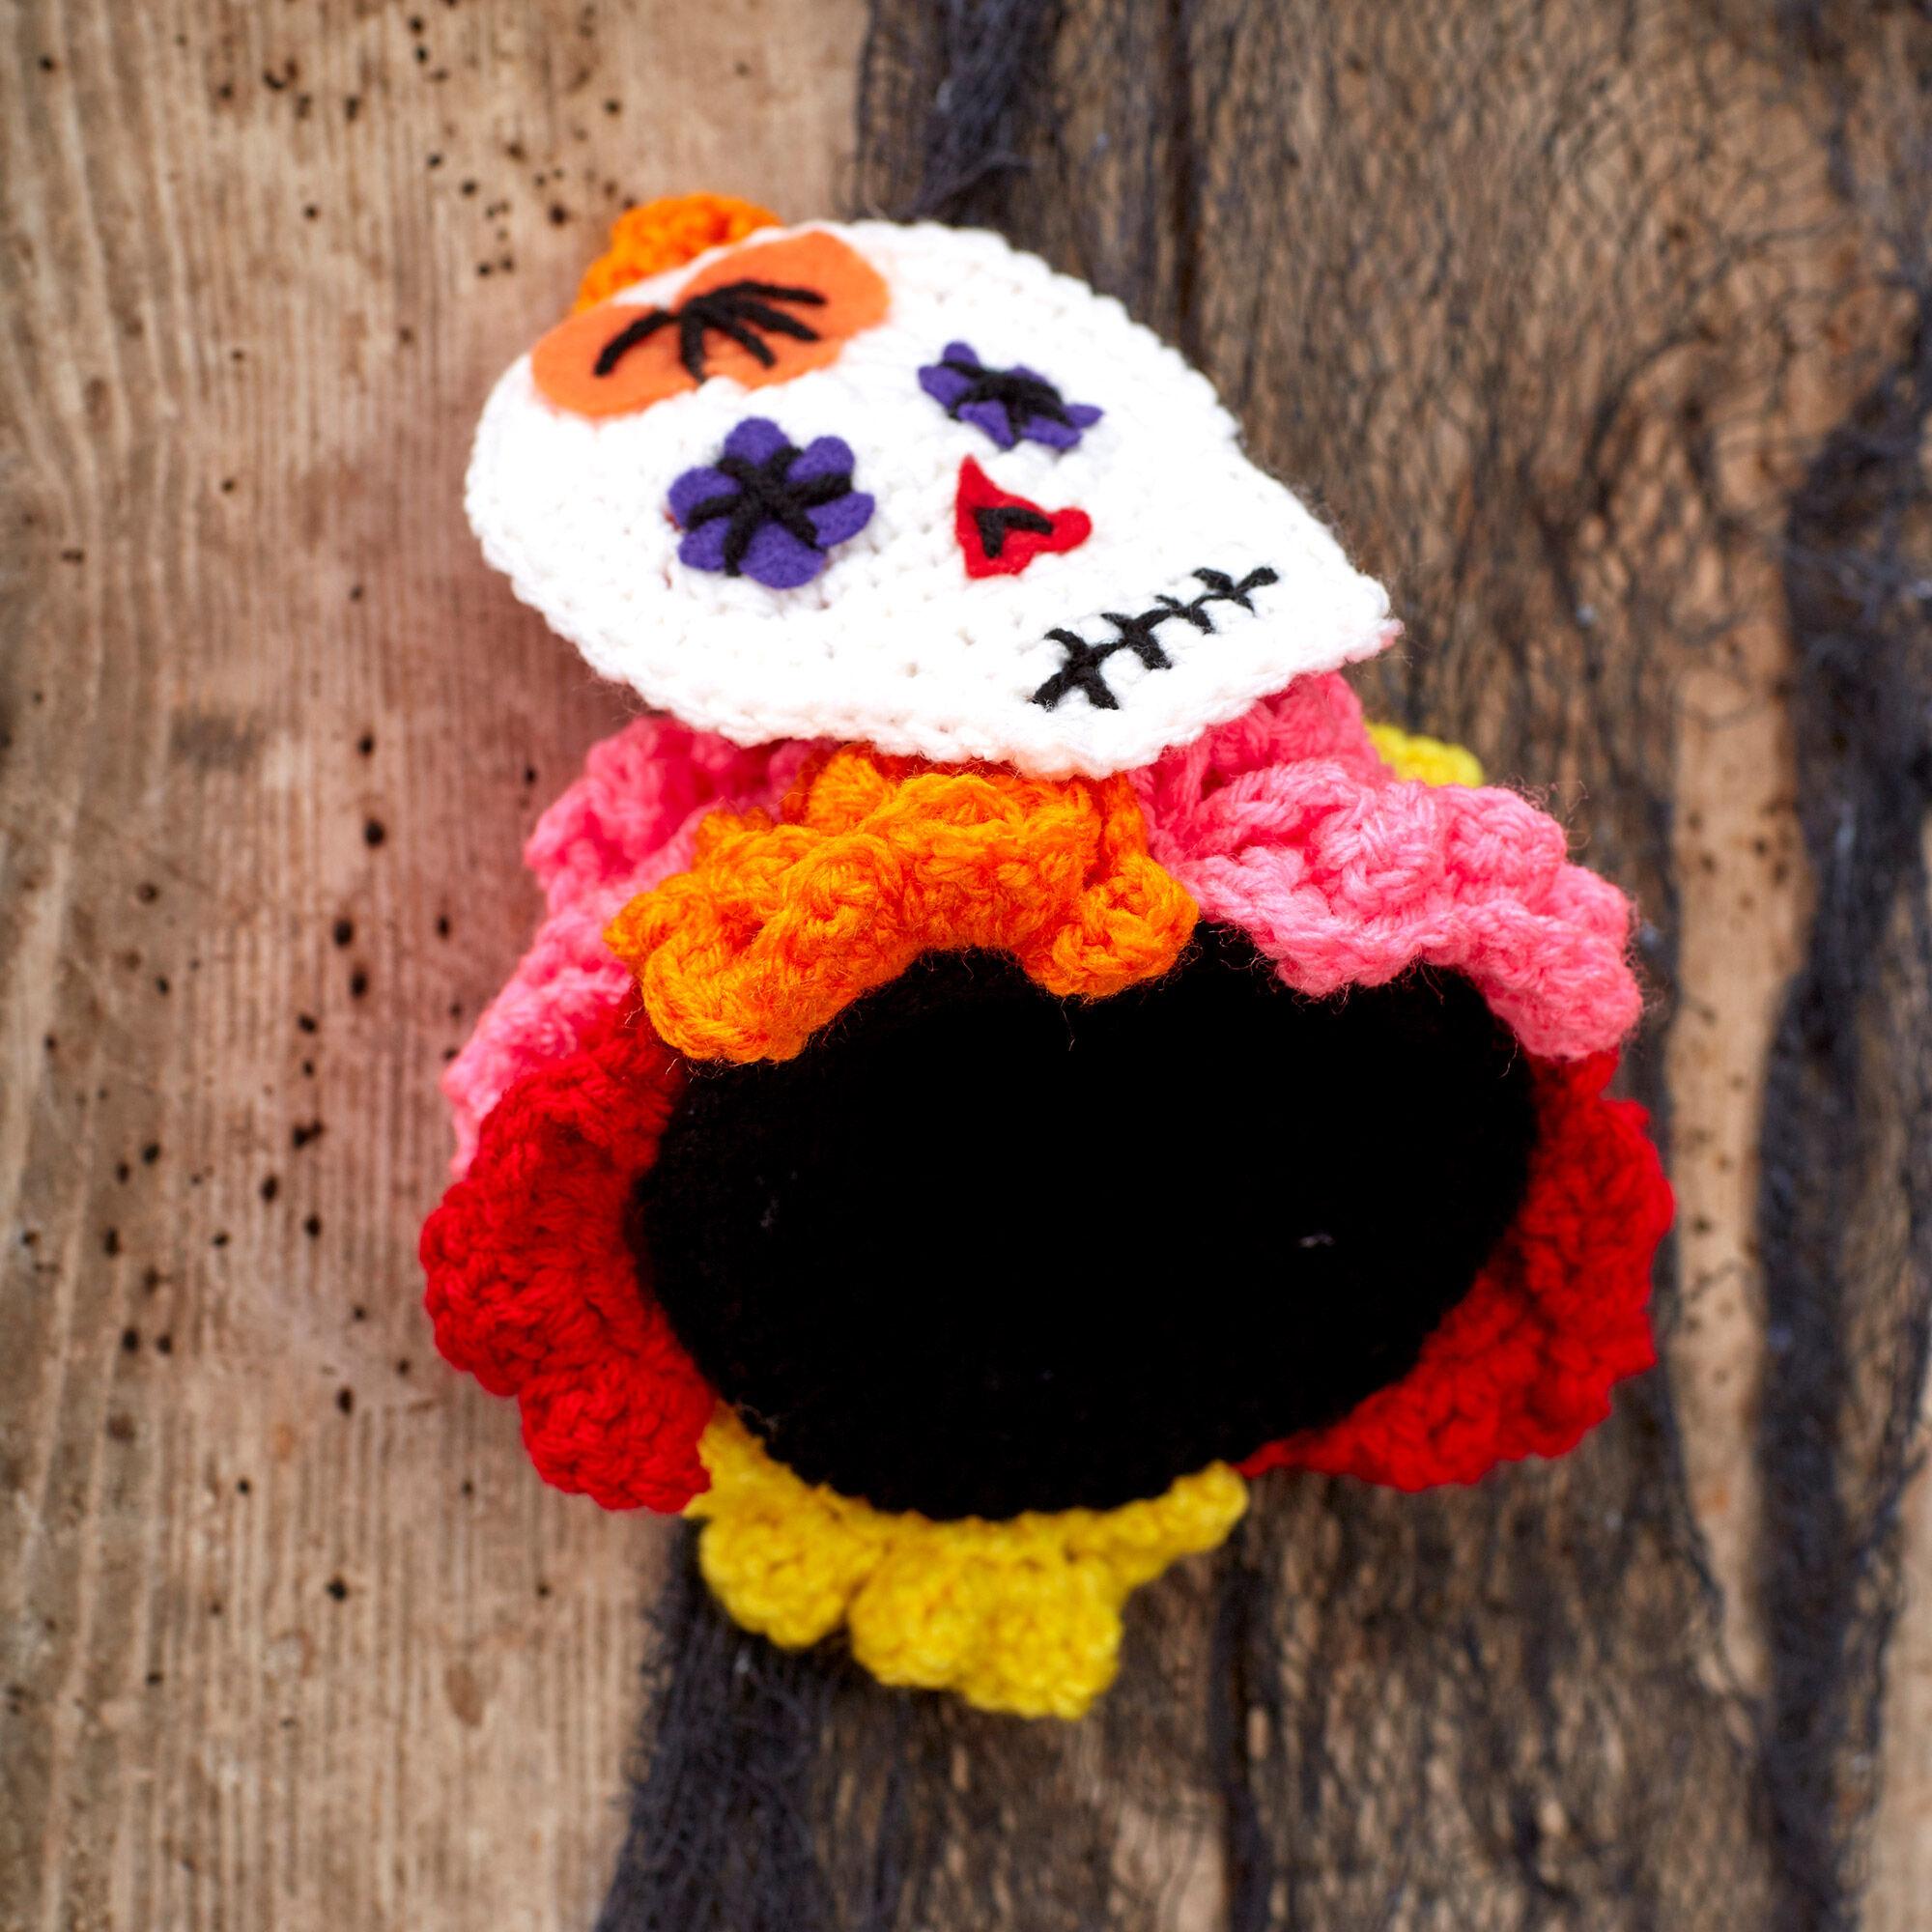 Sugar Skull Amigurumi Free Crochet Pattern • Spin a Yarn Crochet | 2000x2000